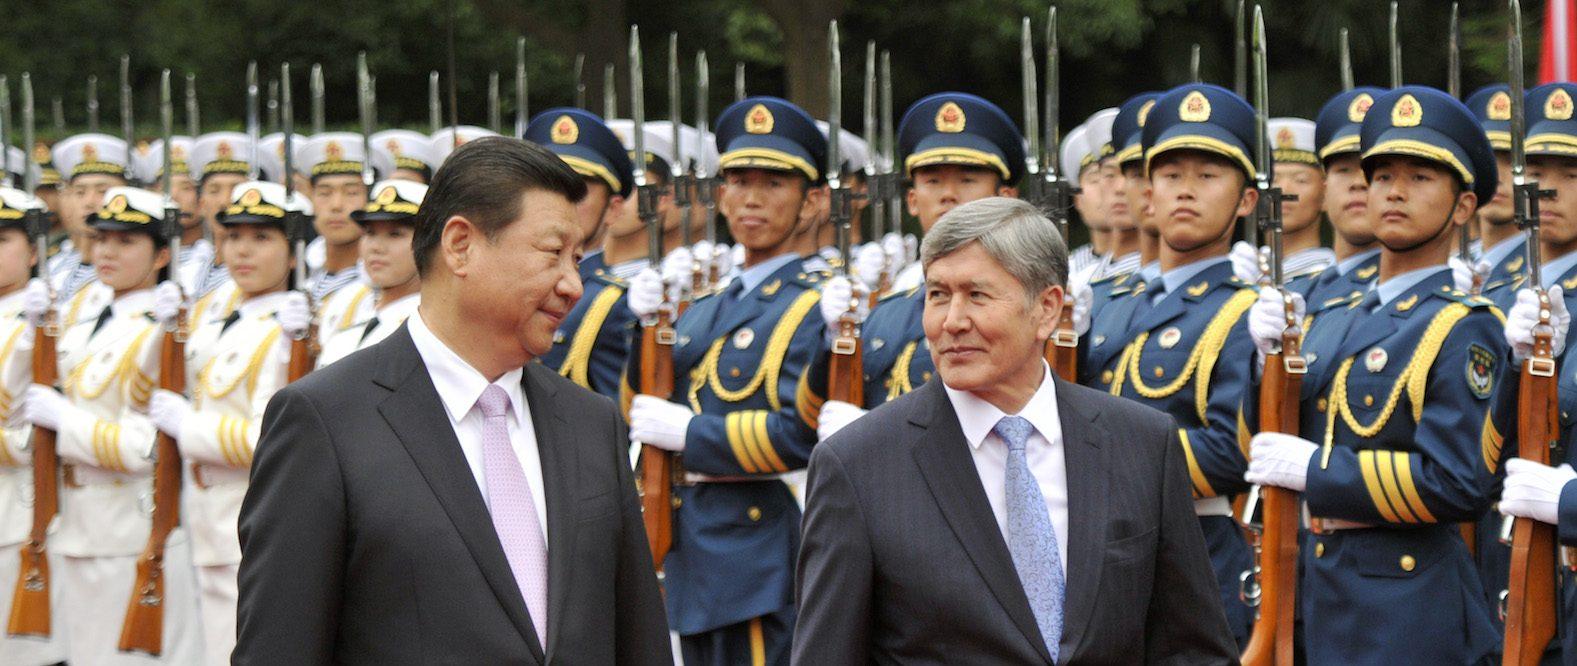 Le président kirghize Almazbek Atambayev (à droite) and son homologue chinois Xi Jinping à Shanghai le 18 mai 2014. (Crédits : AFP PHOTO / KENZABURO FUKUHARA)